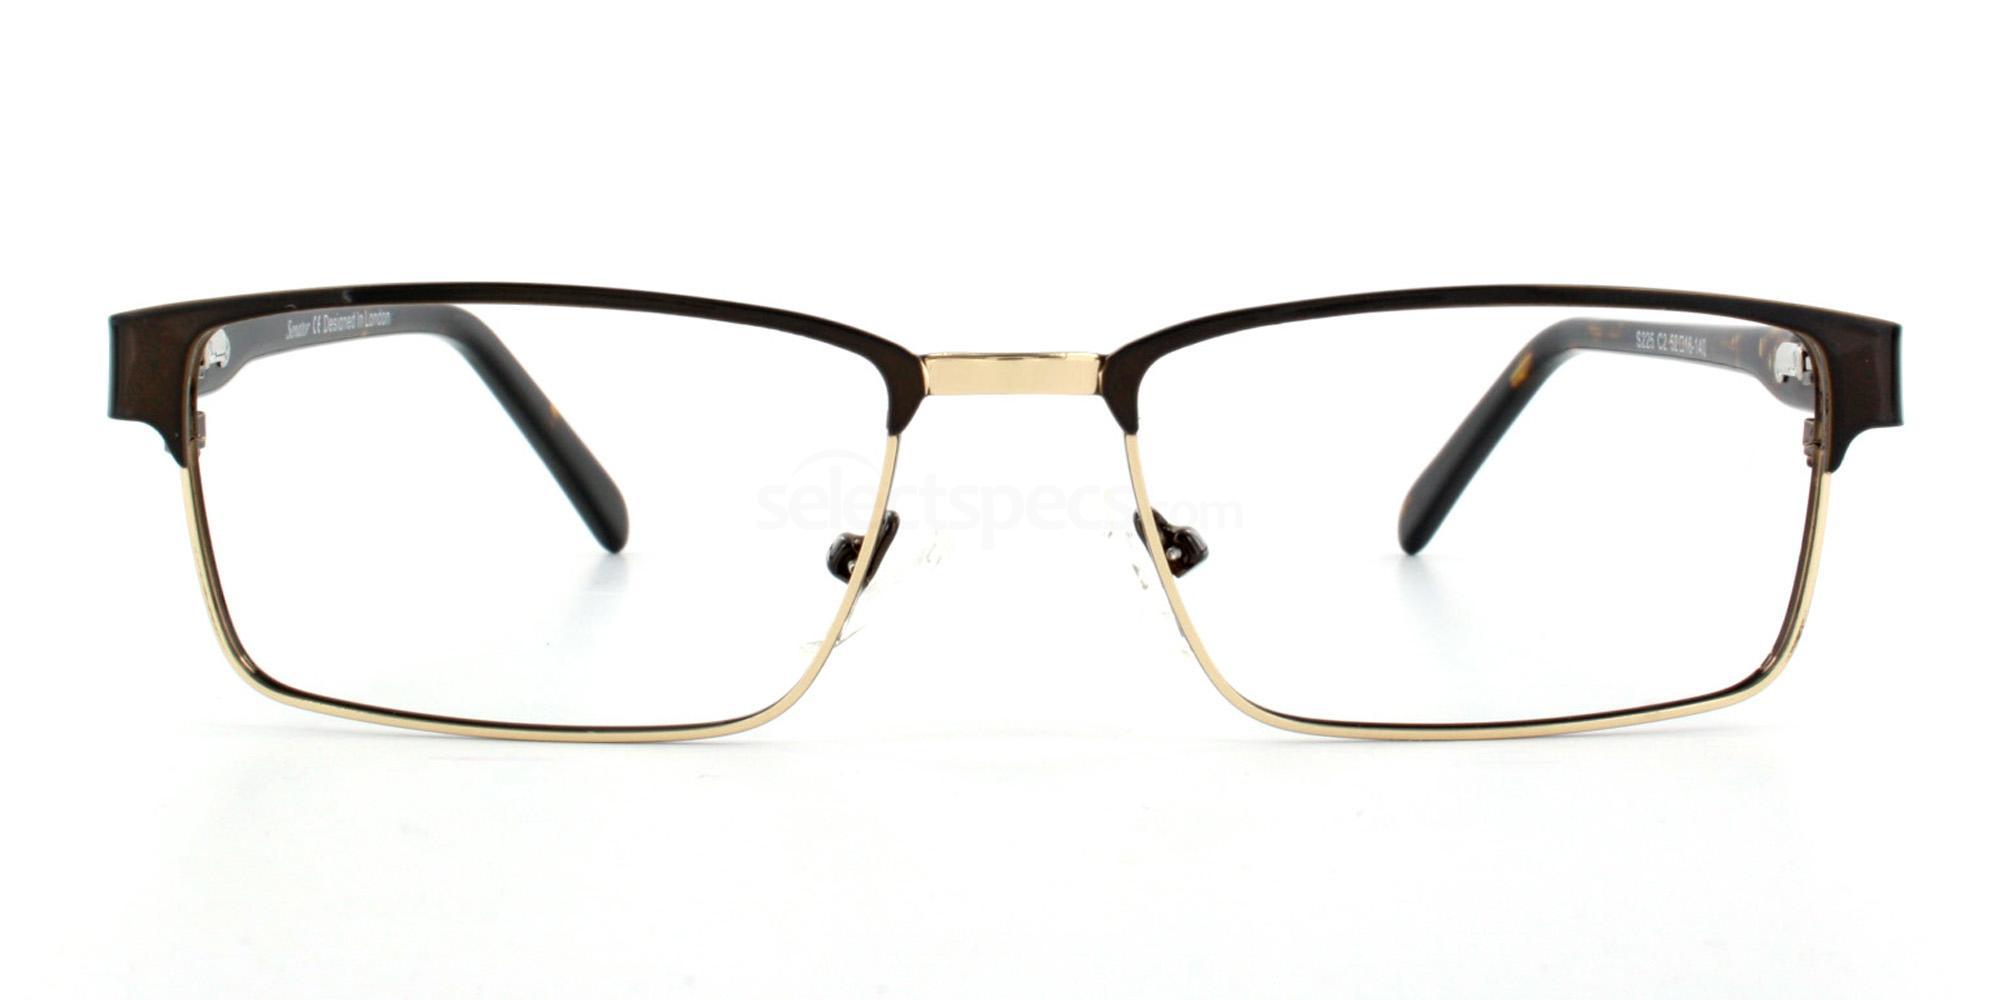 C2 SENATOR 225 Glasses, Senator